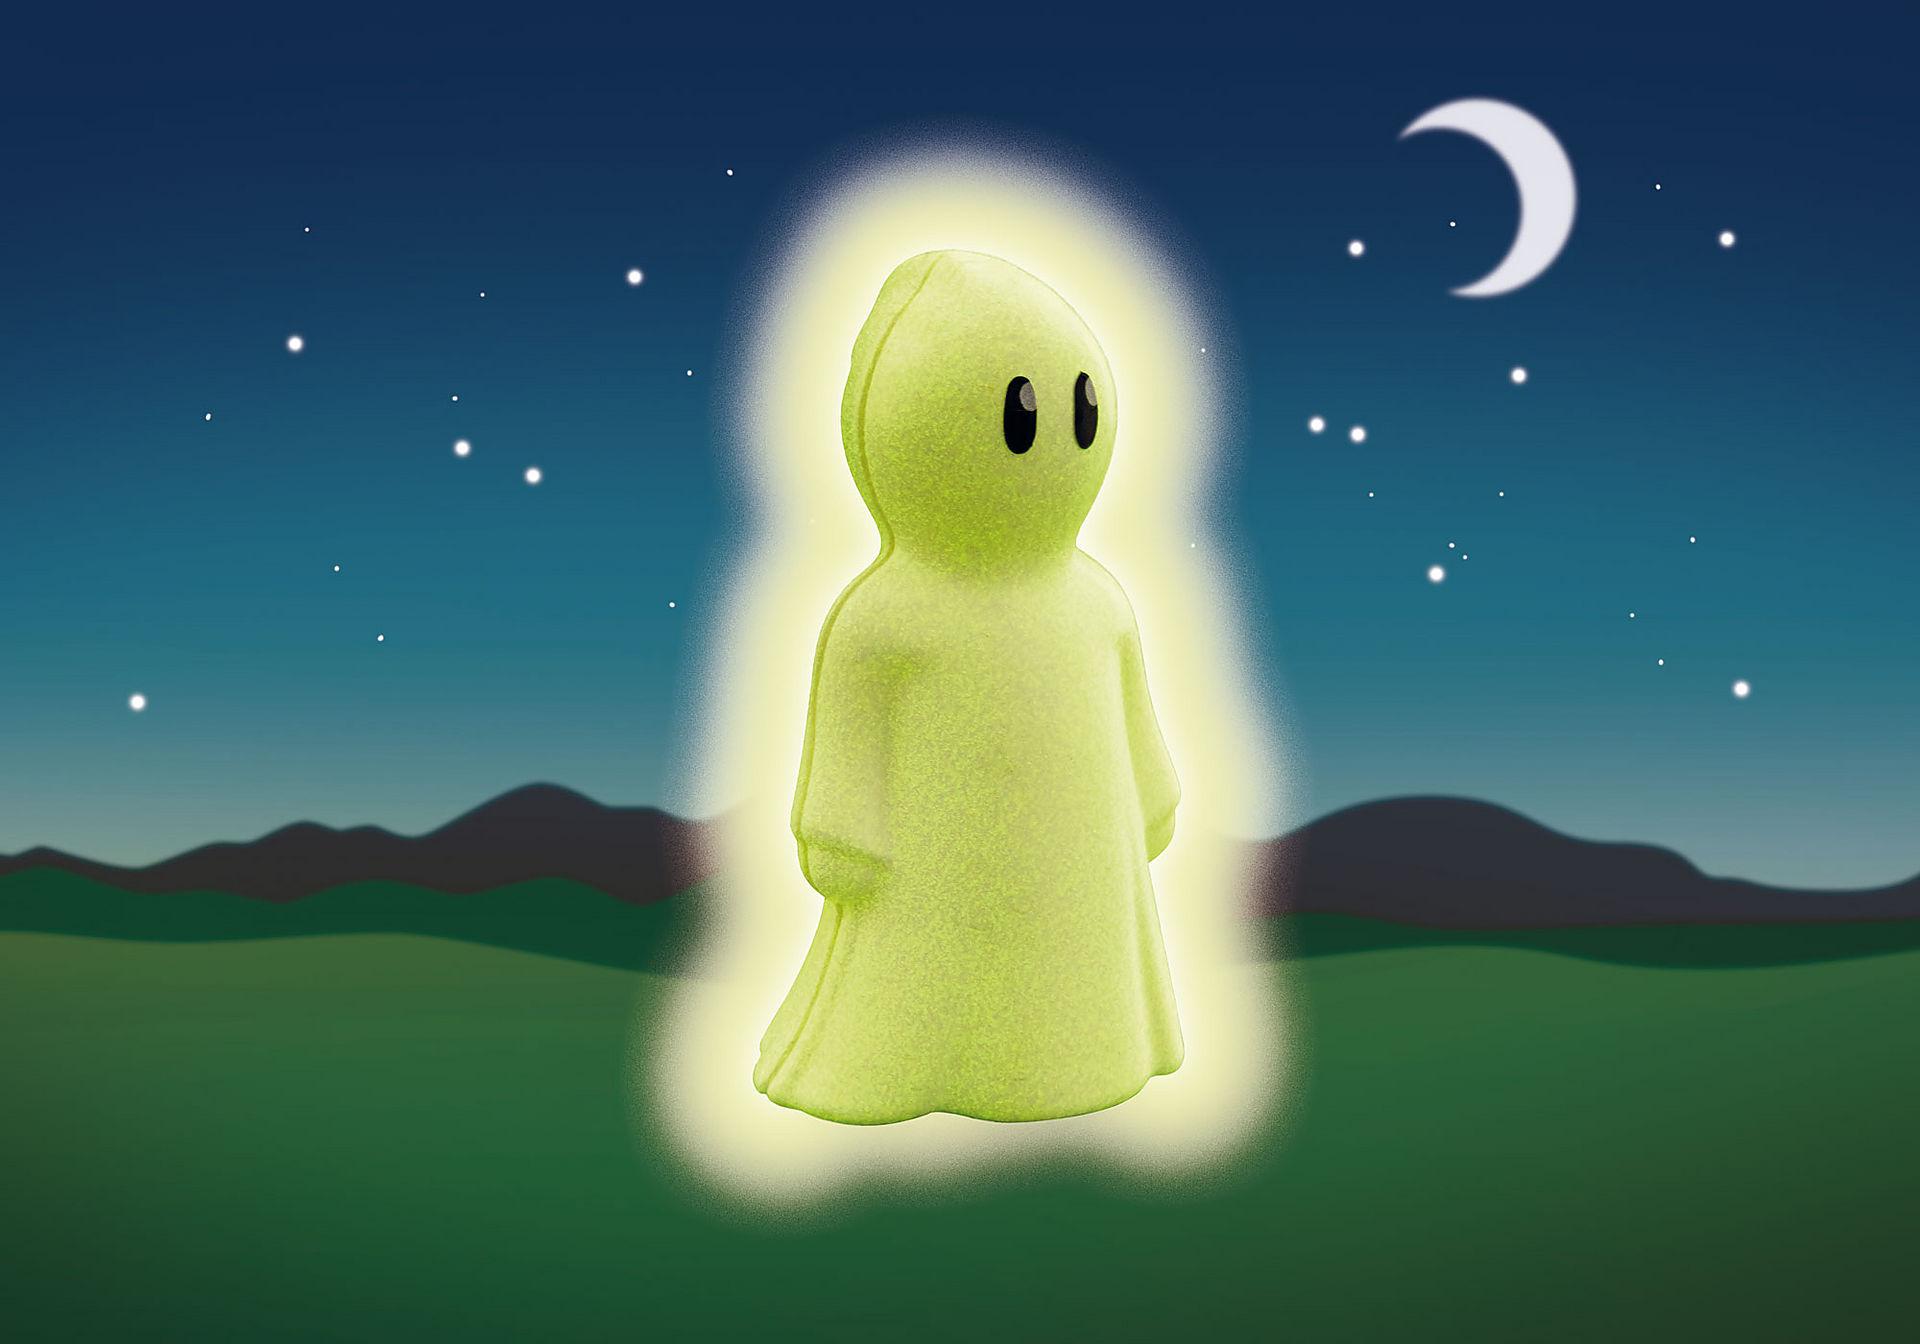 70128 1.2.3 Caballero con Fantasma zoom image4